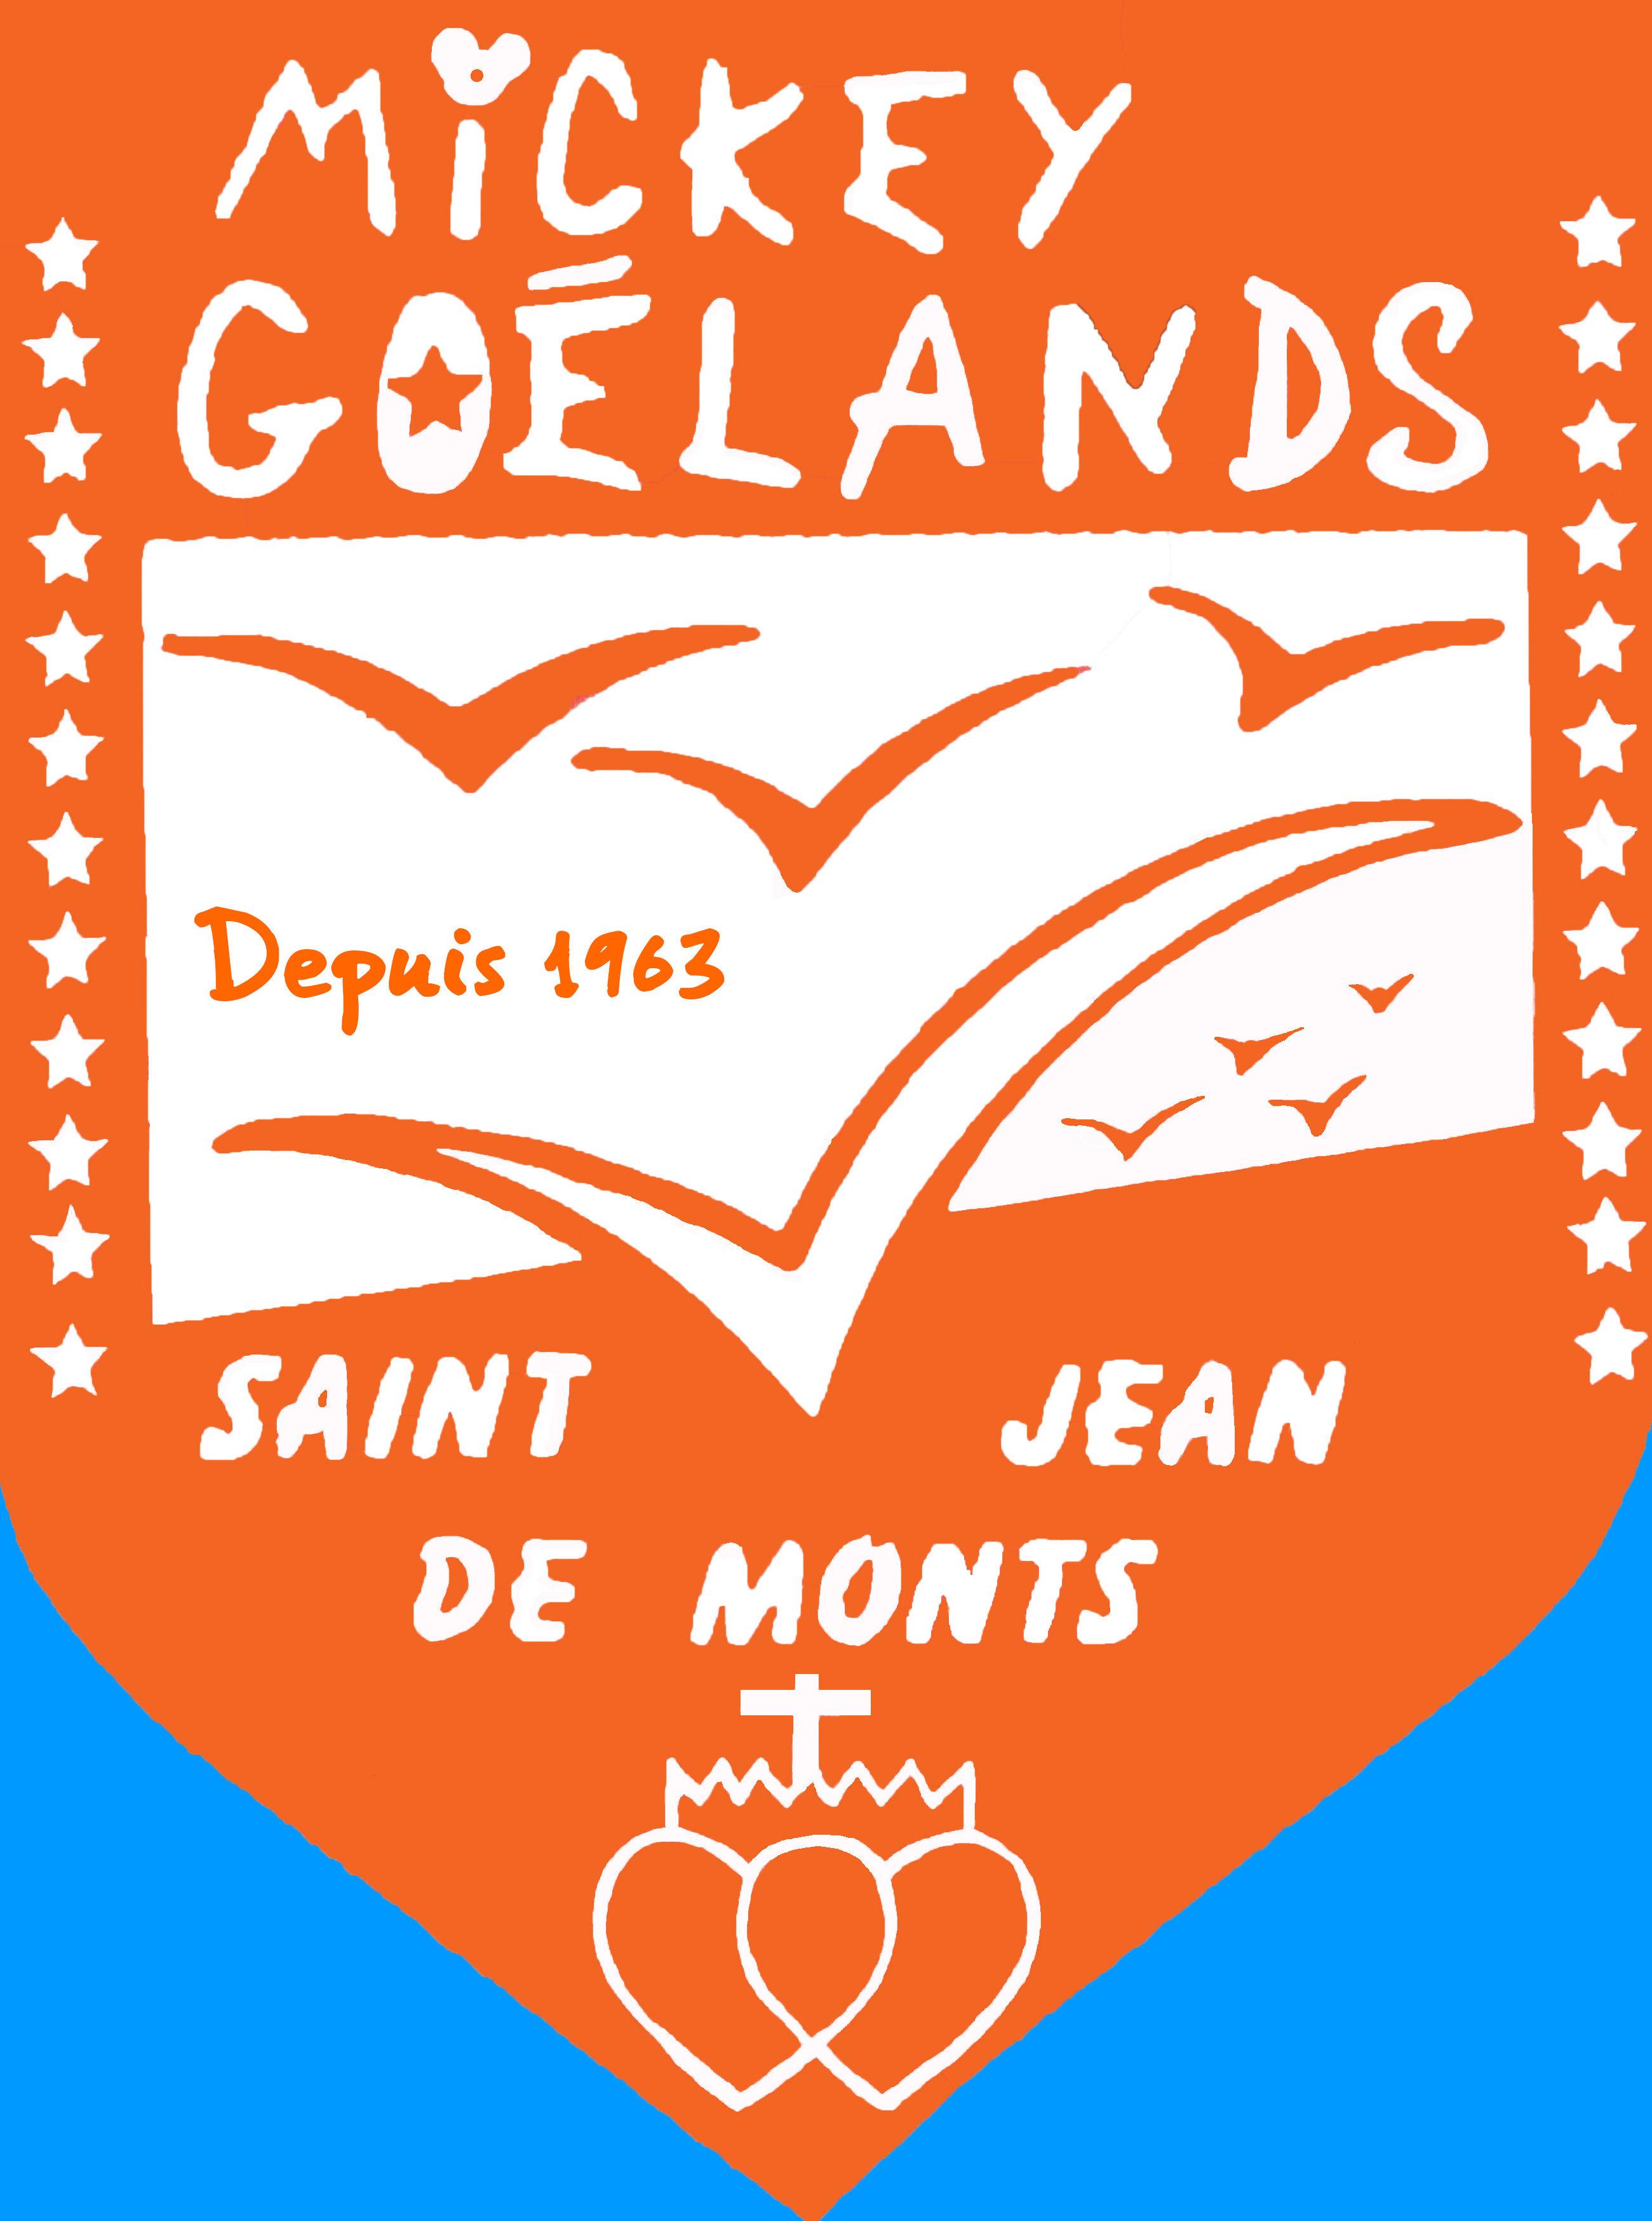 Club de Plage Mickey Goelands Saint Jean de Monts